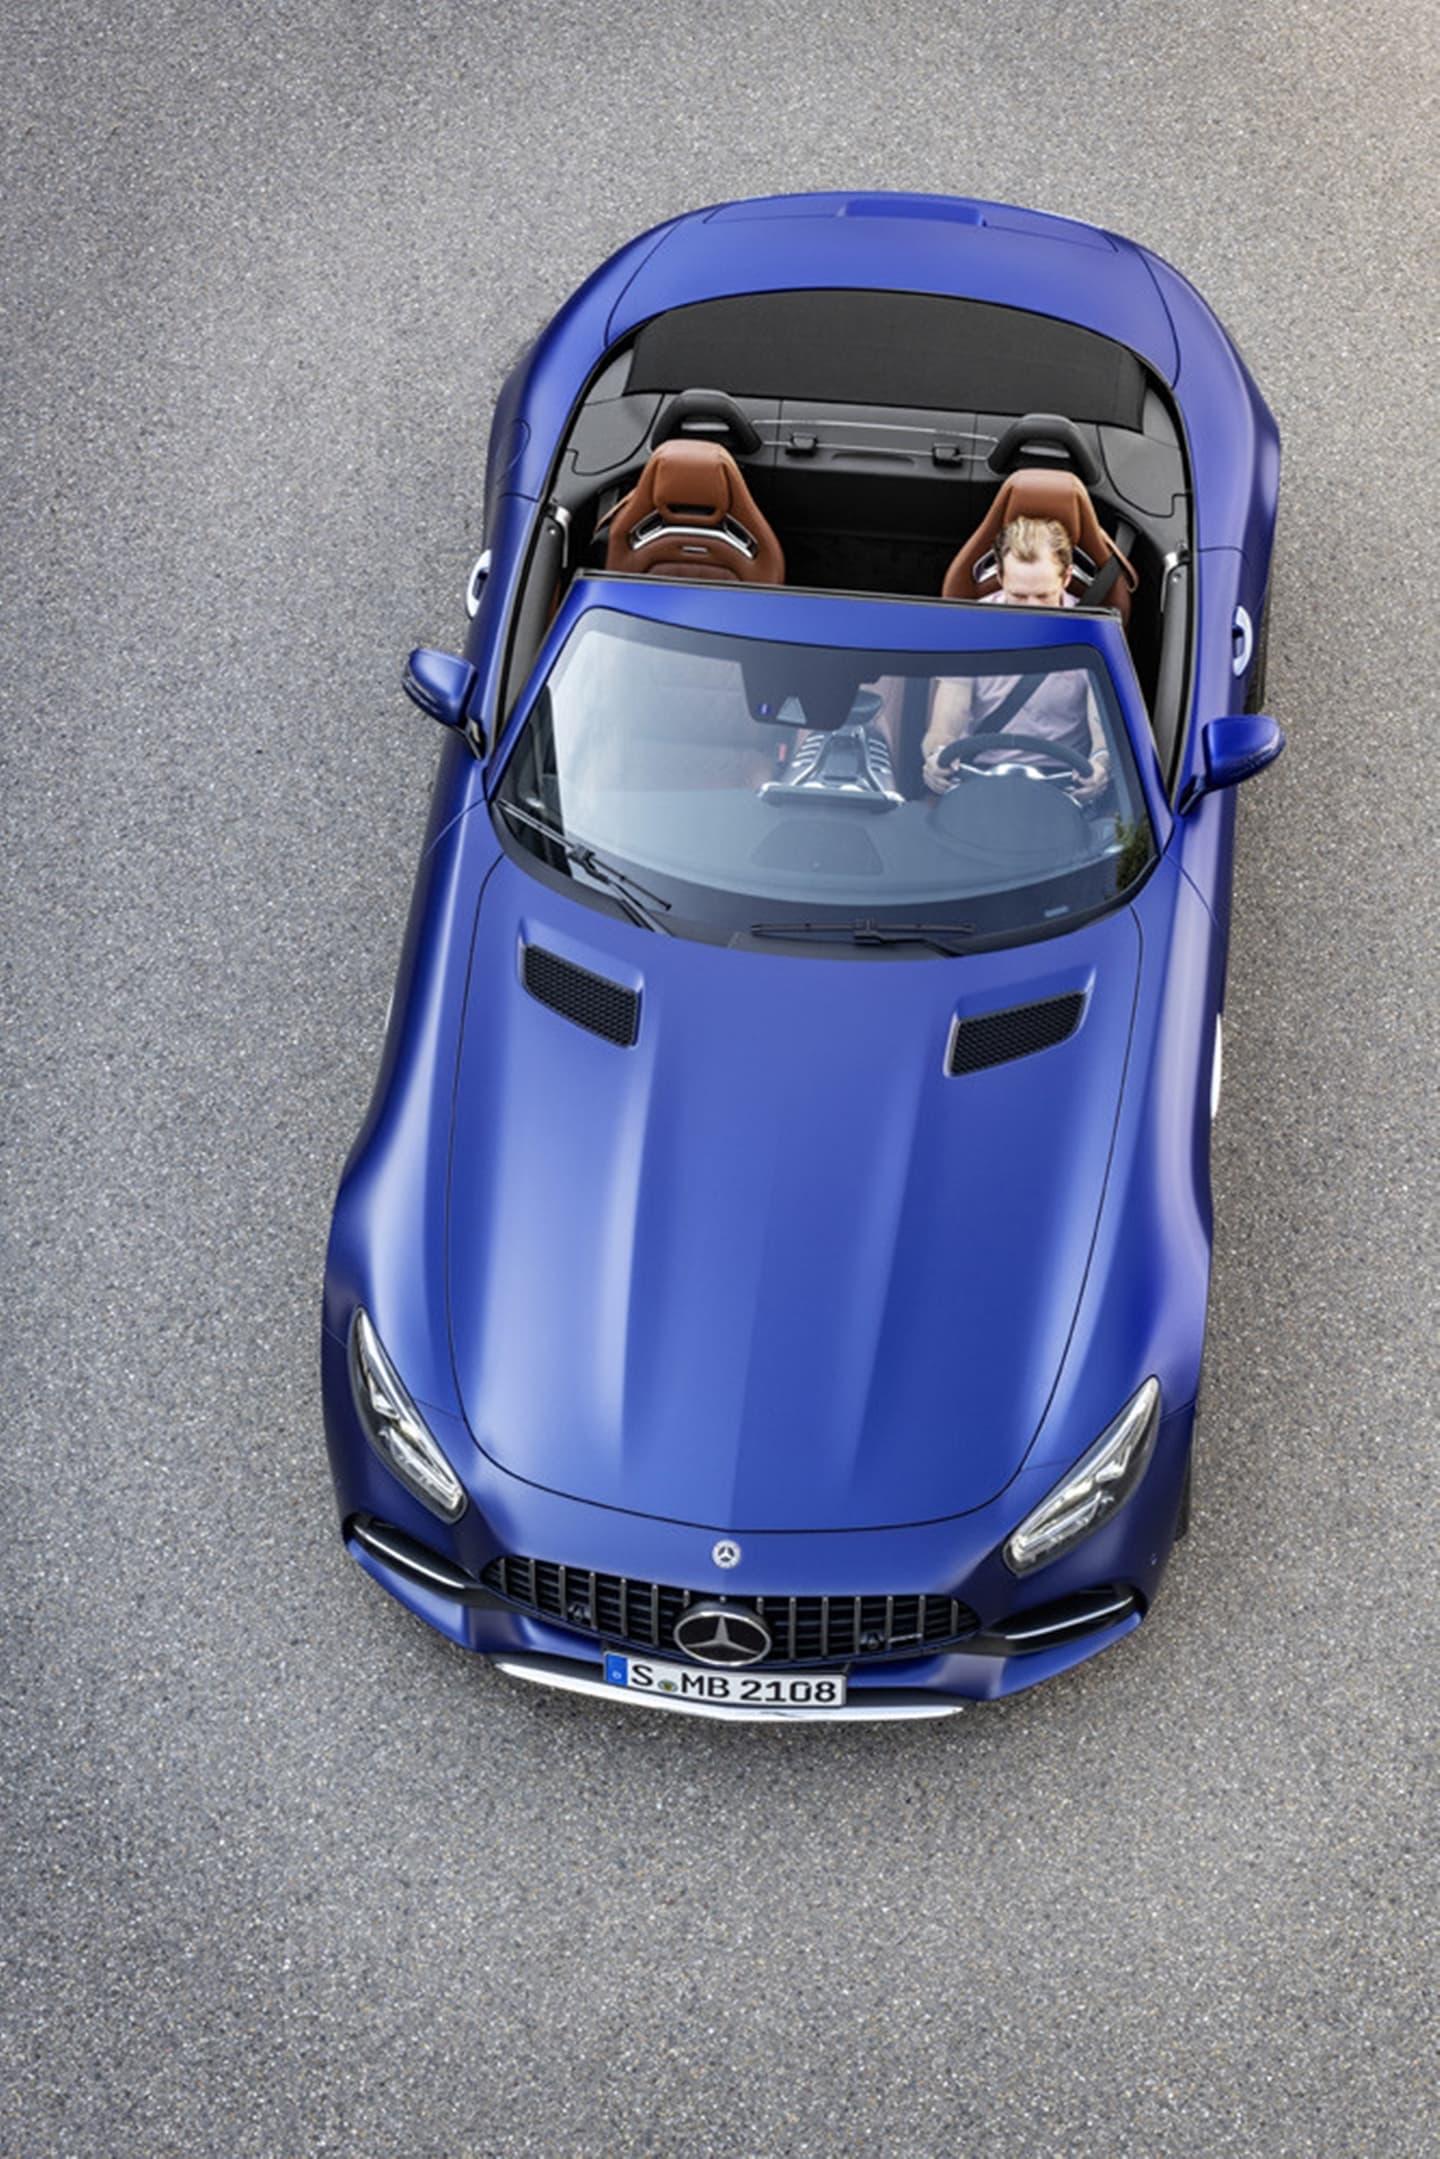 Mercedes Amg Gt 2019 1118 014